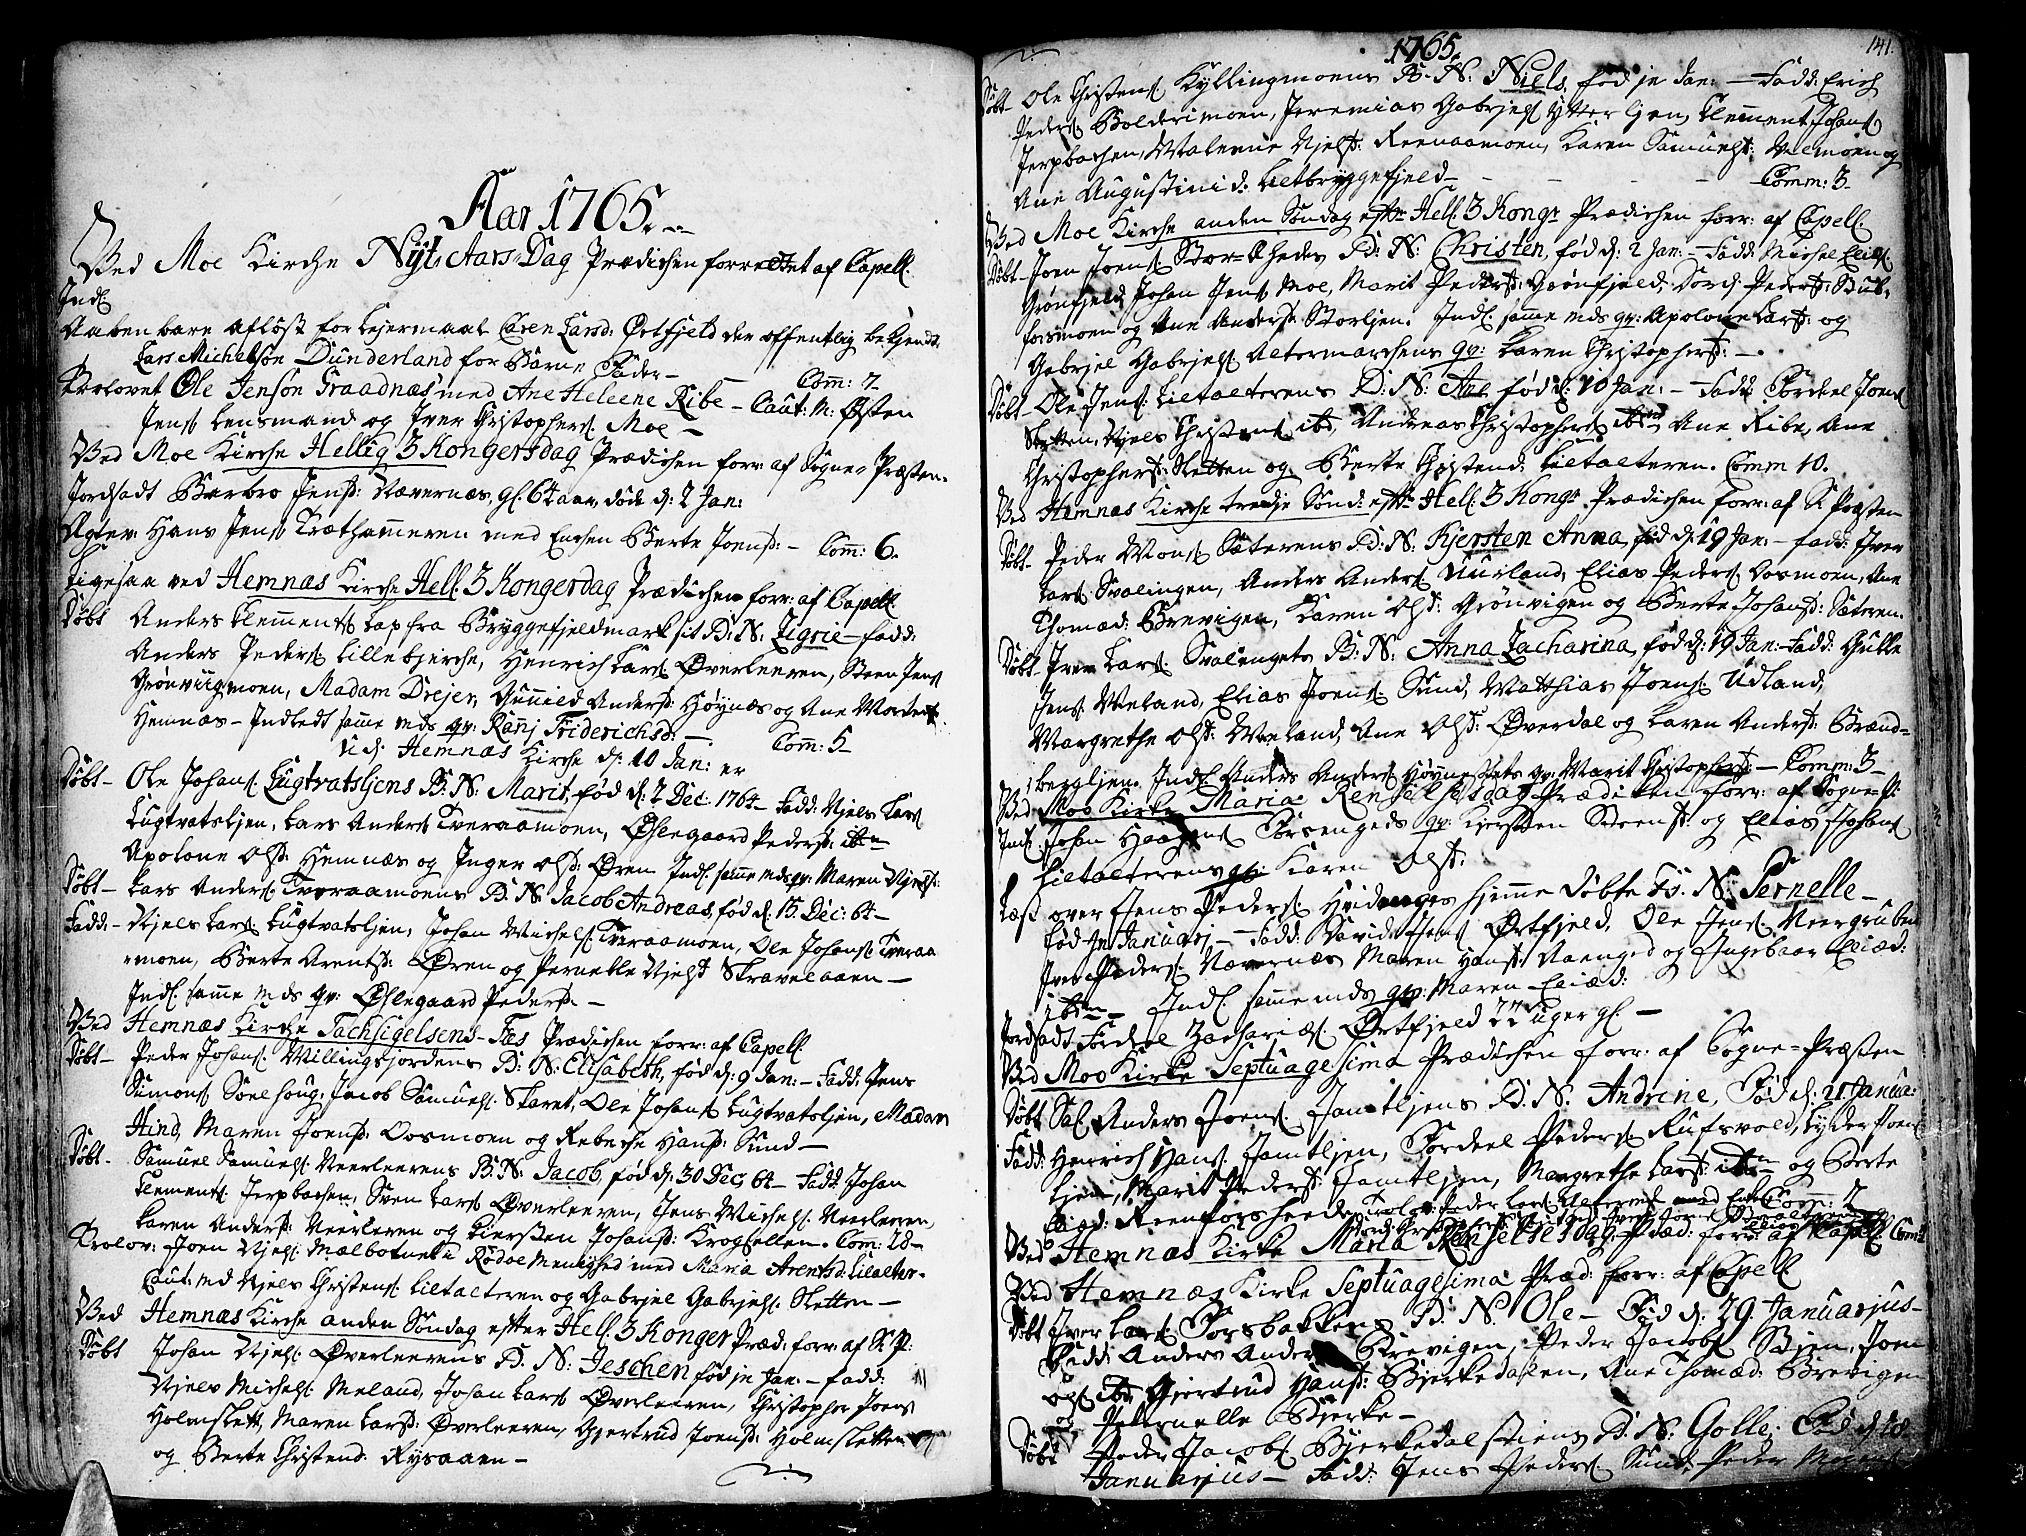 SAT, Ministerialprotokoller, klokkerbøker og fødselsregistre - Nordland, 825/L0348: Ministerialbok nr. 825A04, 1752-1788, s. 141